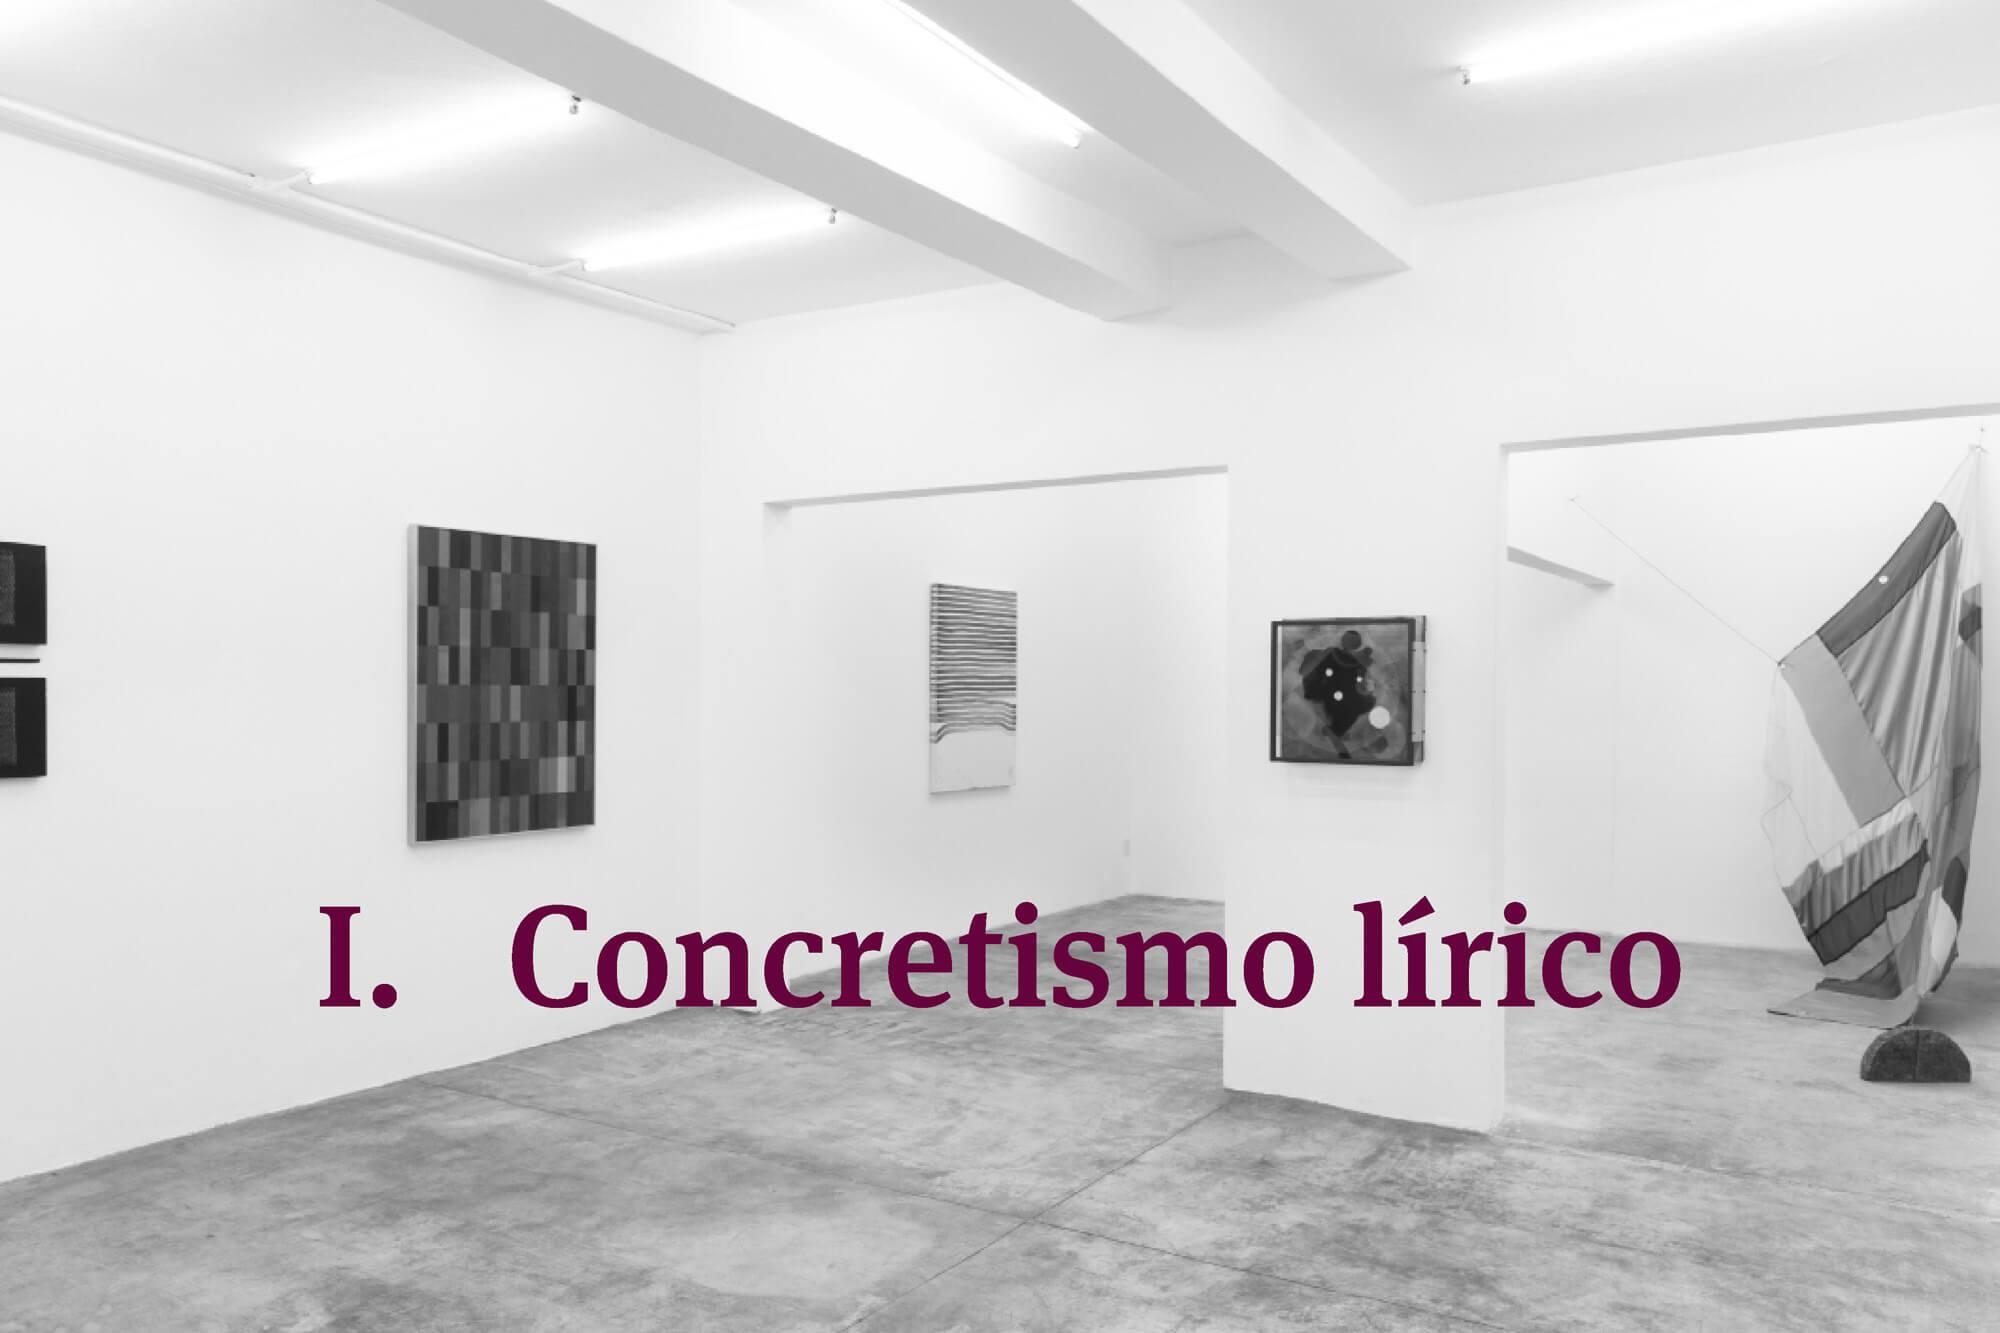 Concretismo lírico - Agenda Cultural